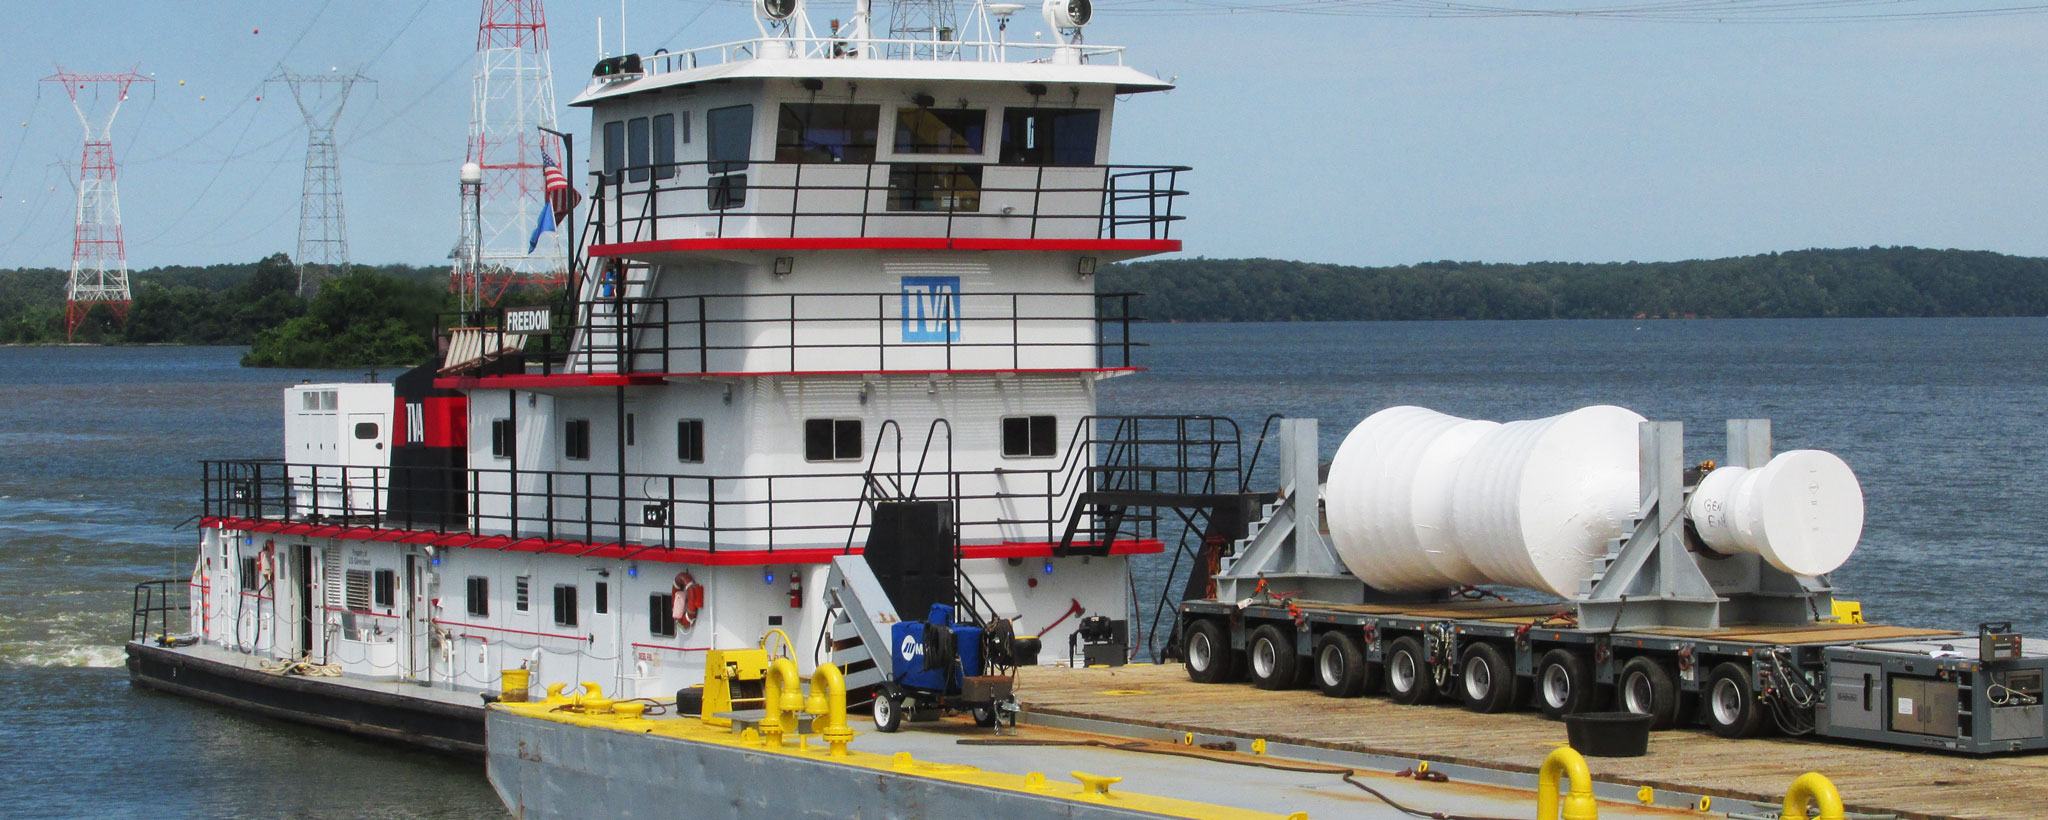 TVA Tug Boat with Generator